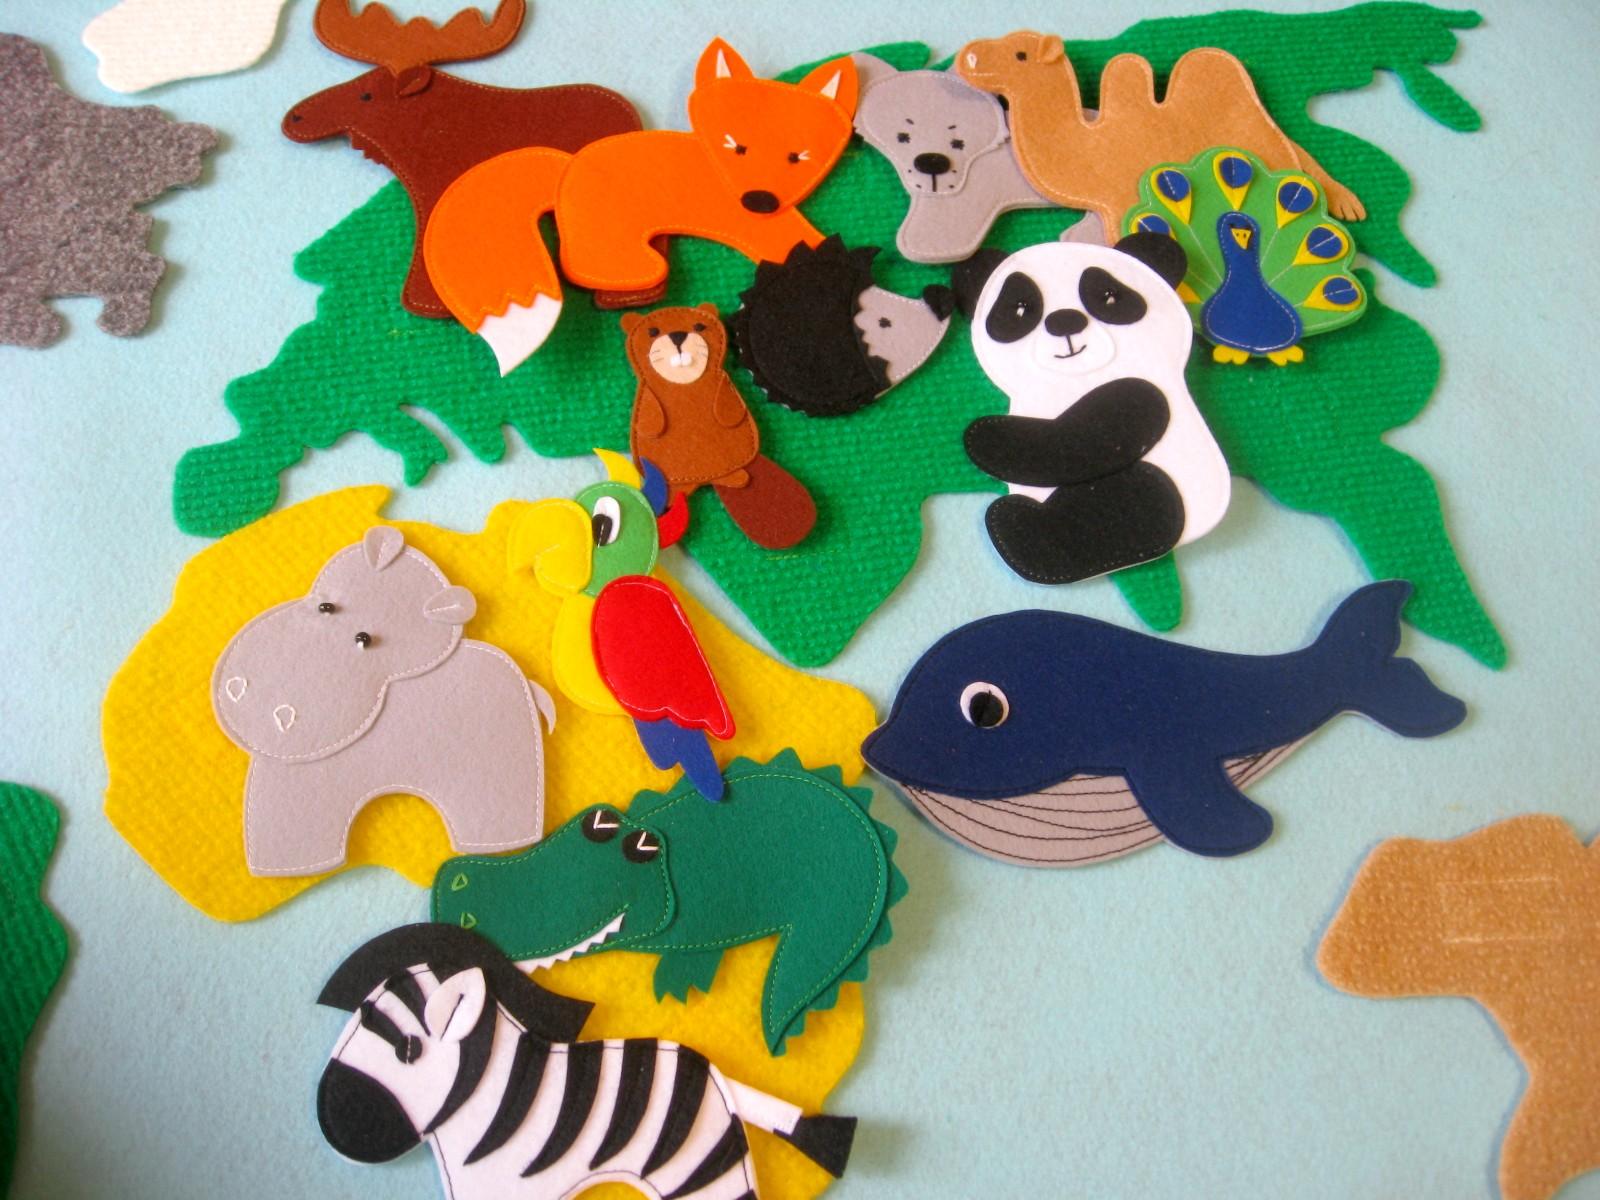 игрушки из фетра на липучках животные карта мира